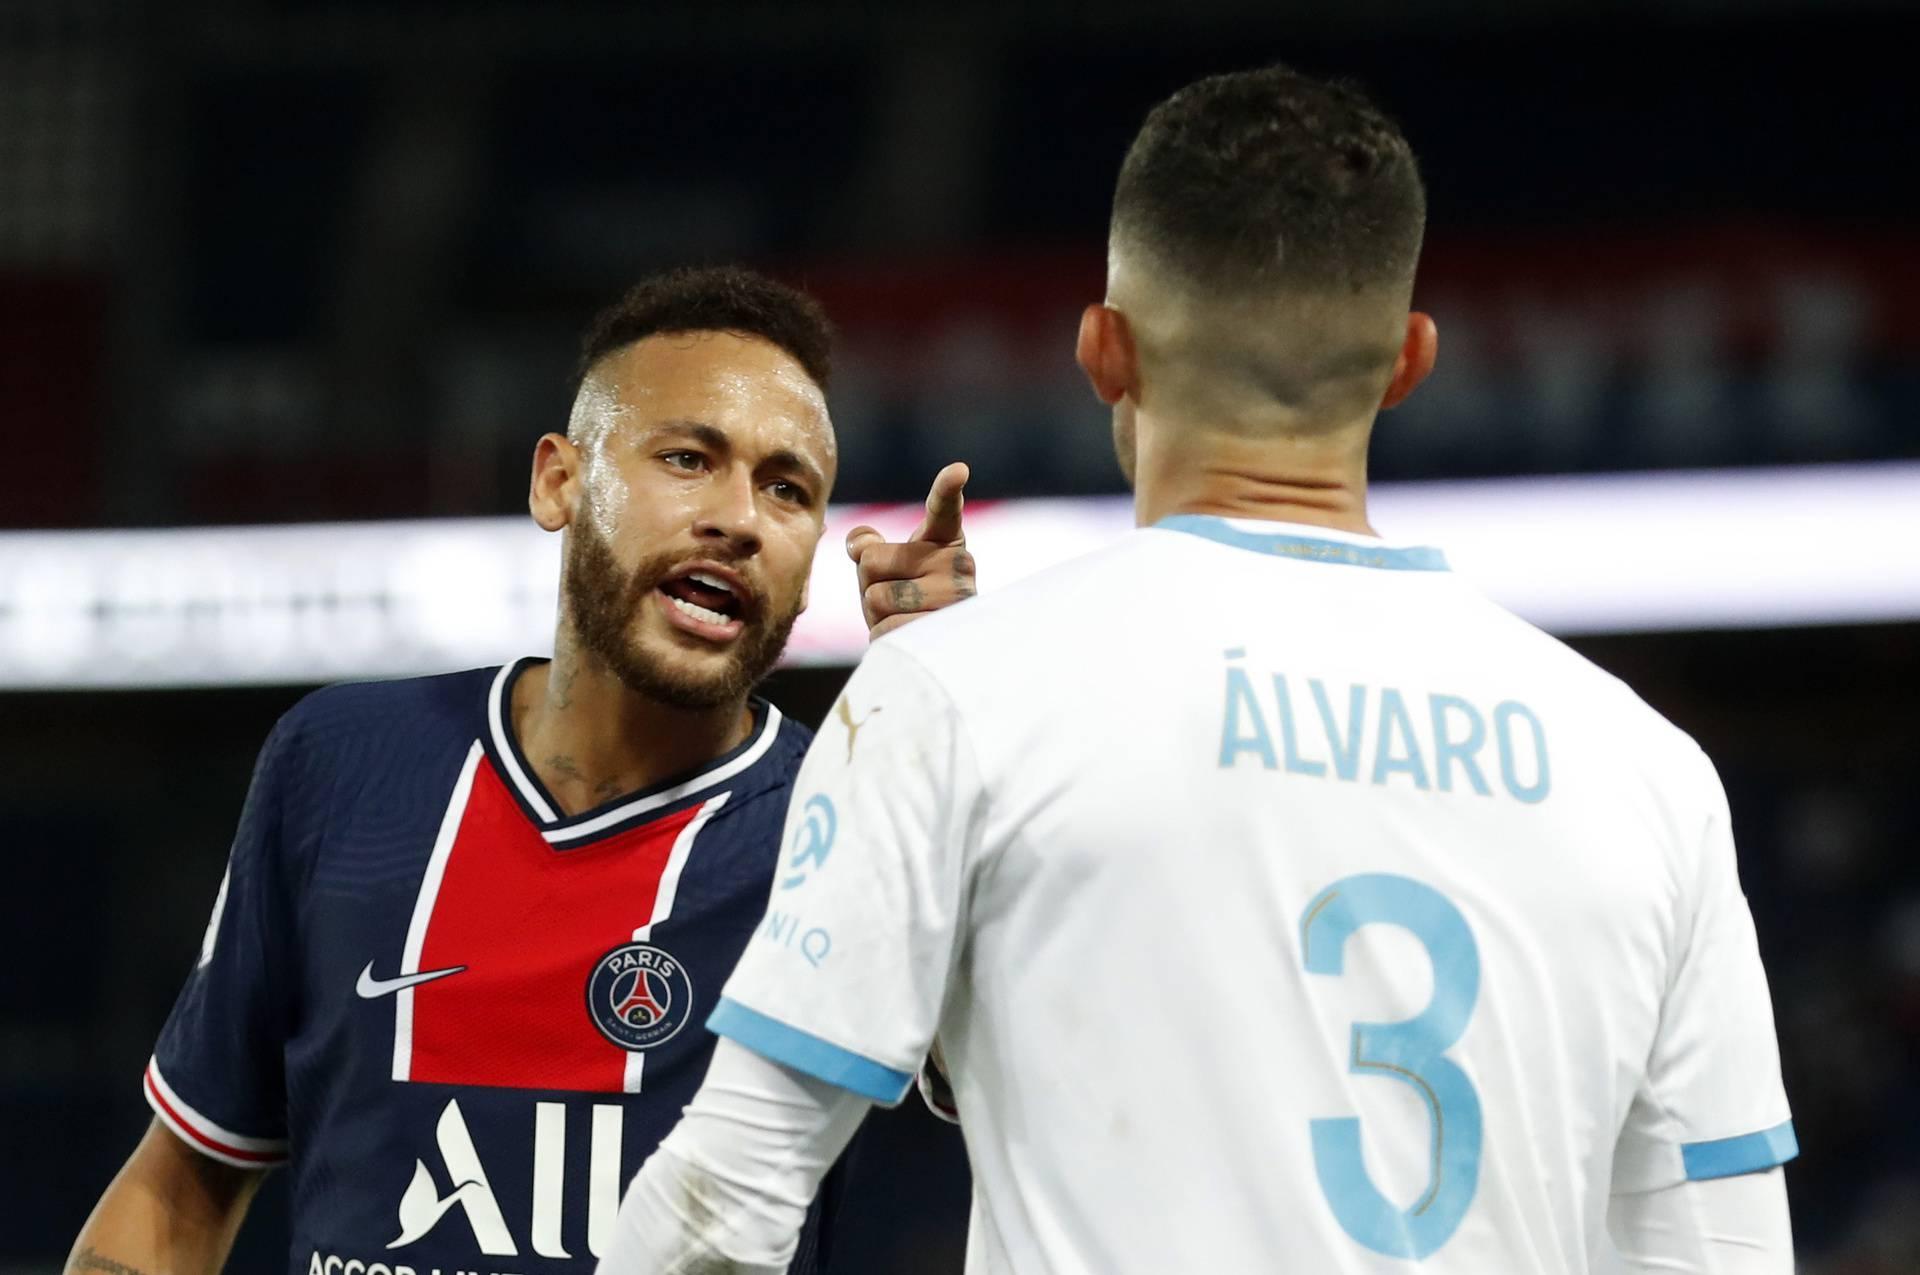 Ligue 1 - Paris St Germain v Olympique de Marseille